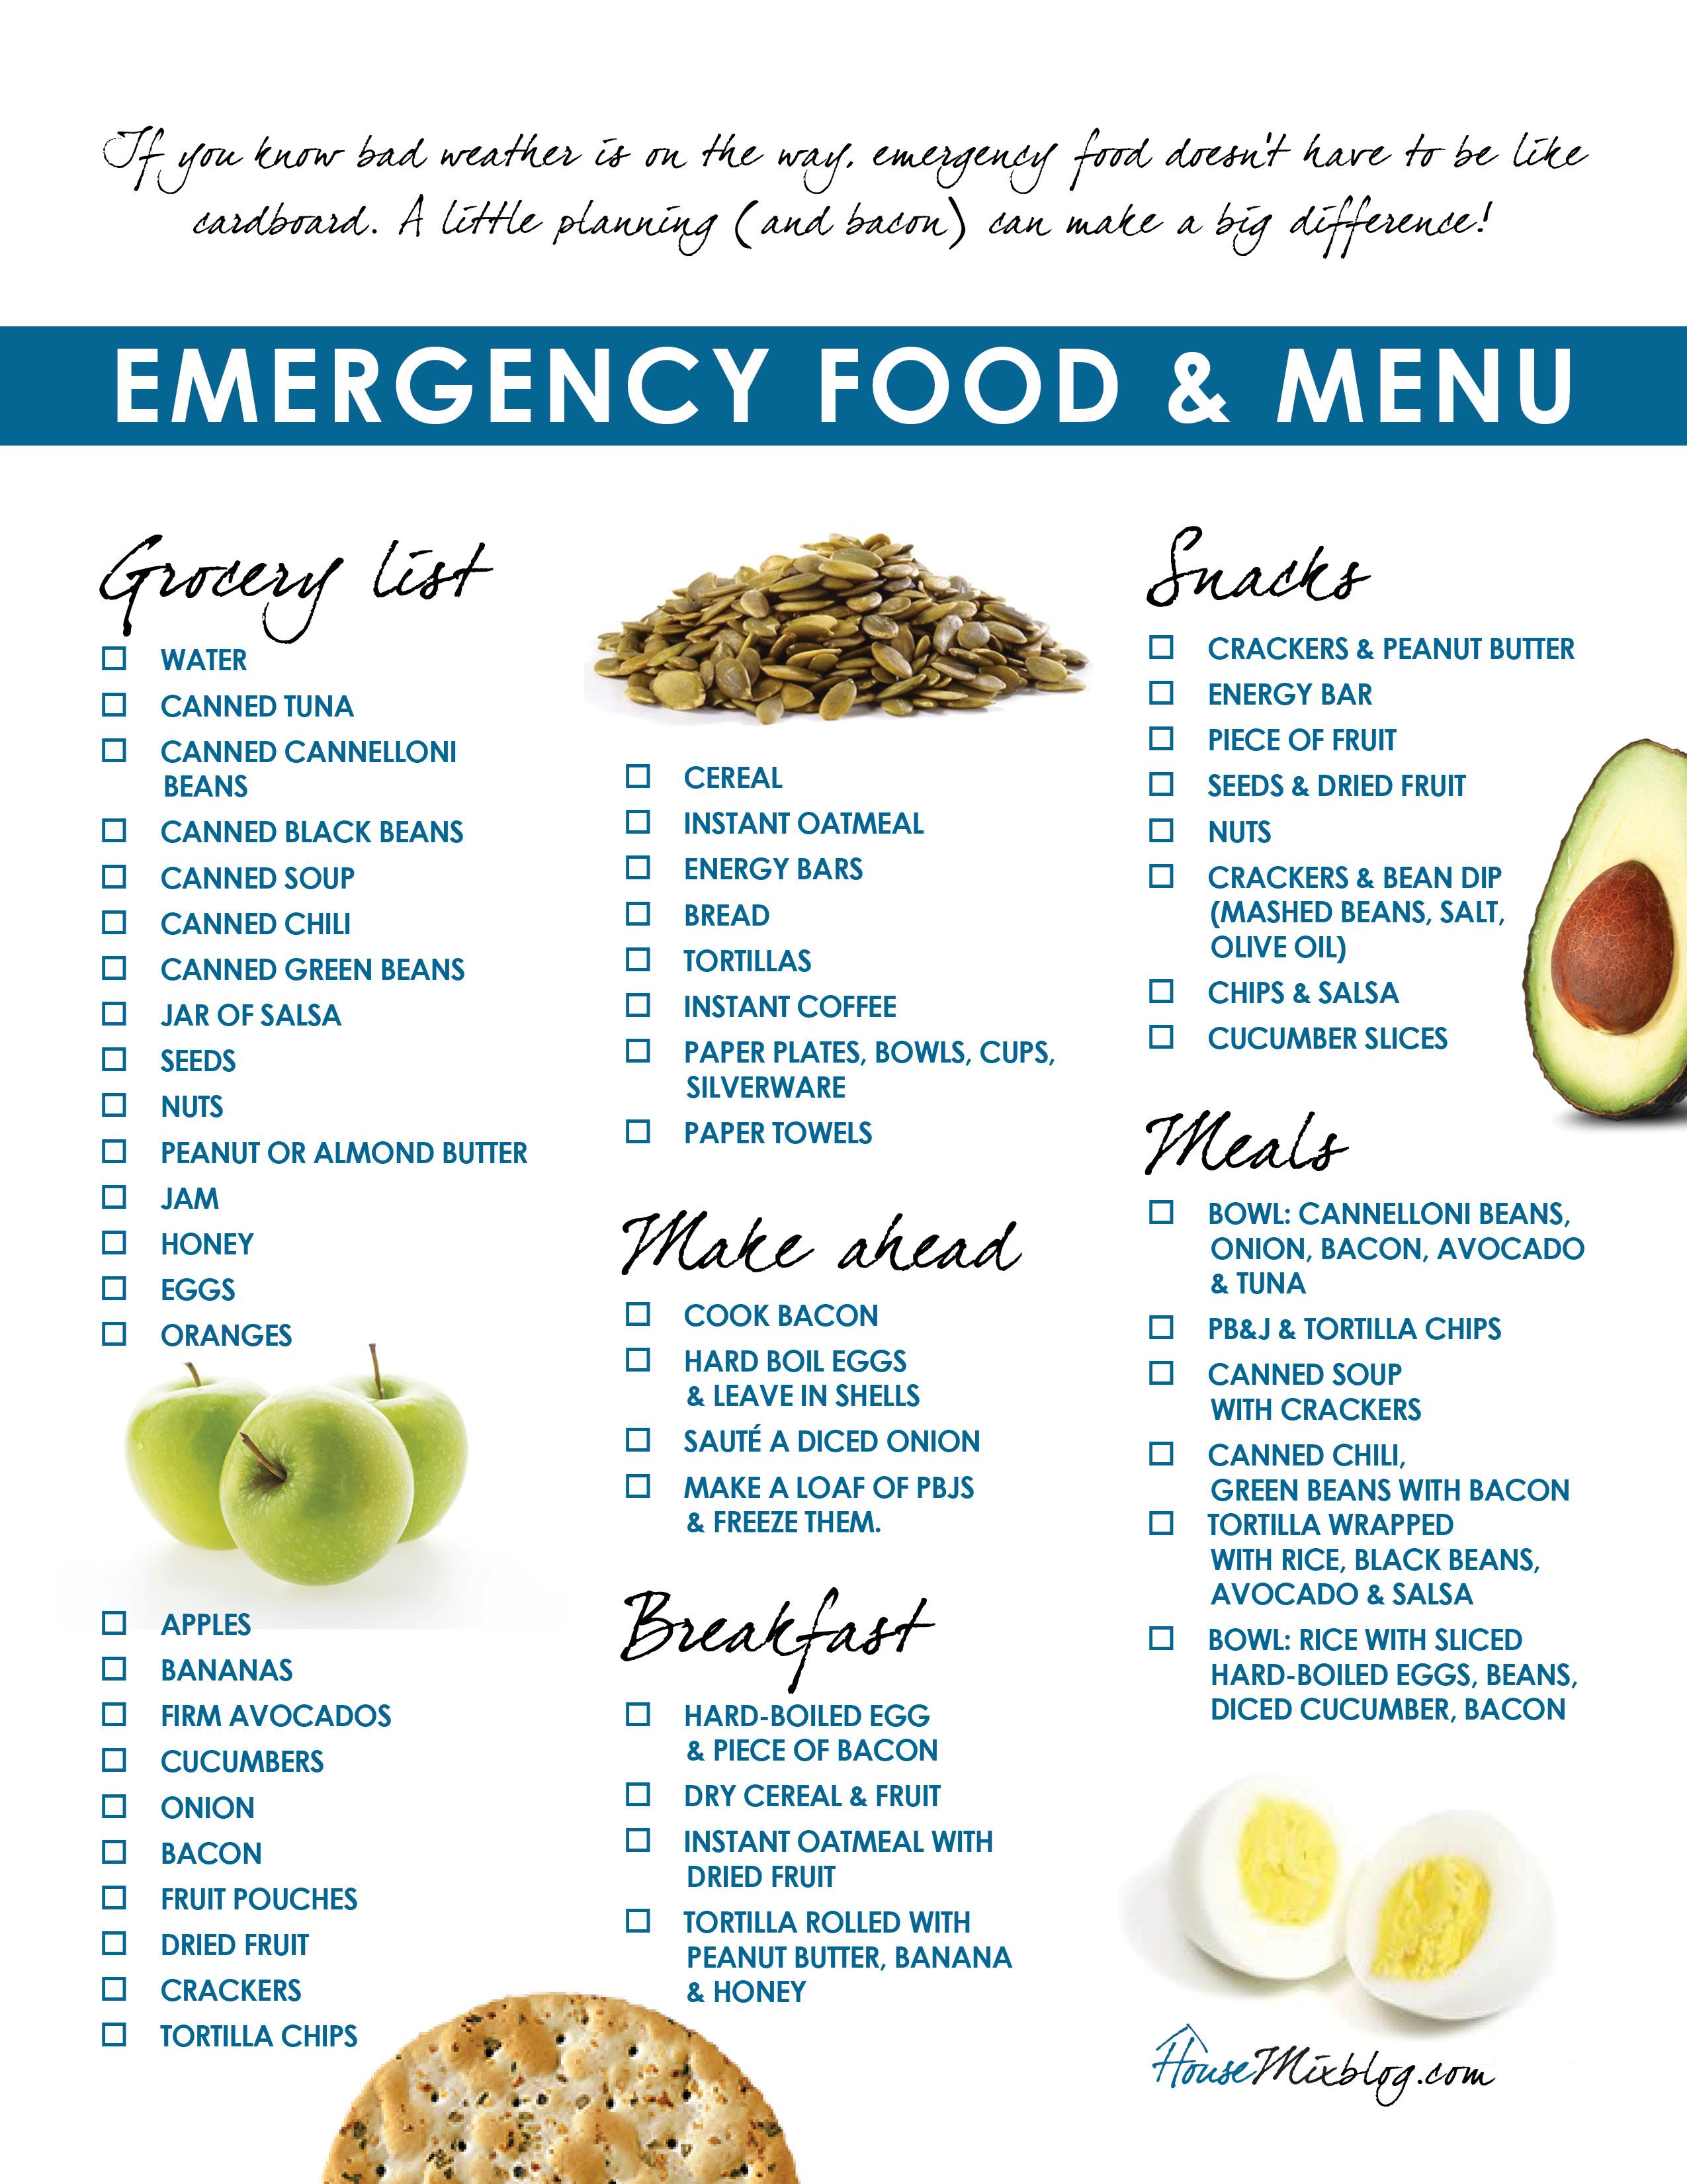 http://www.housemixblog.com/2017/09/06/printable-hurricane-preparation-checklist/